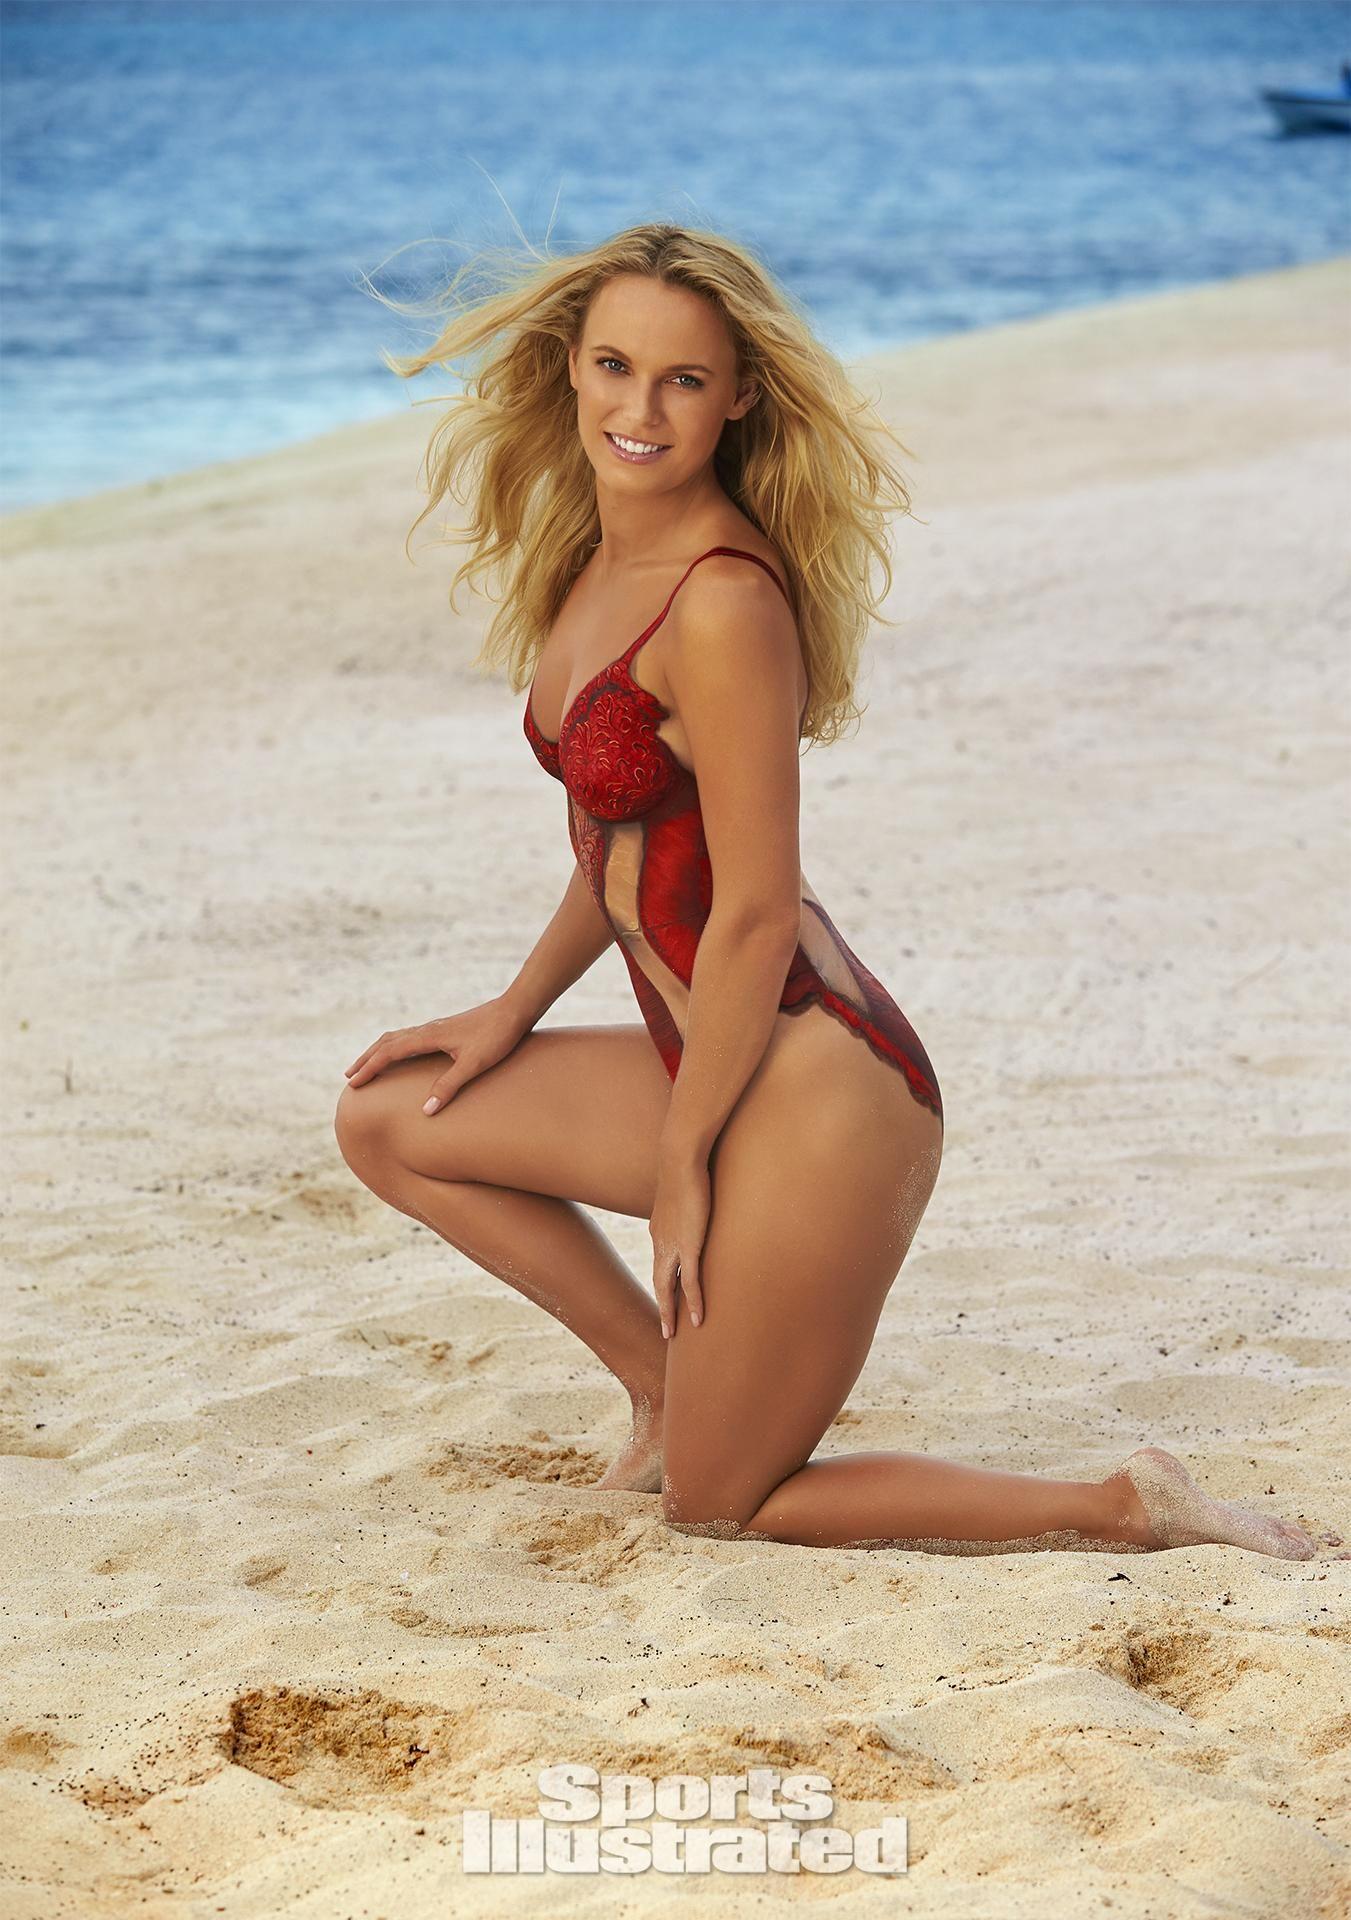 2016 swimwear si swimsuit bodypaint sports illustrated body painting ...